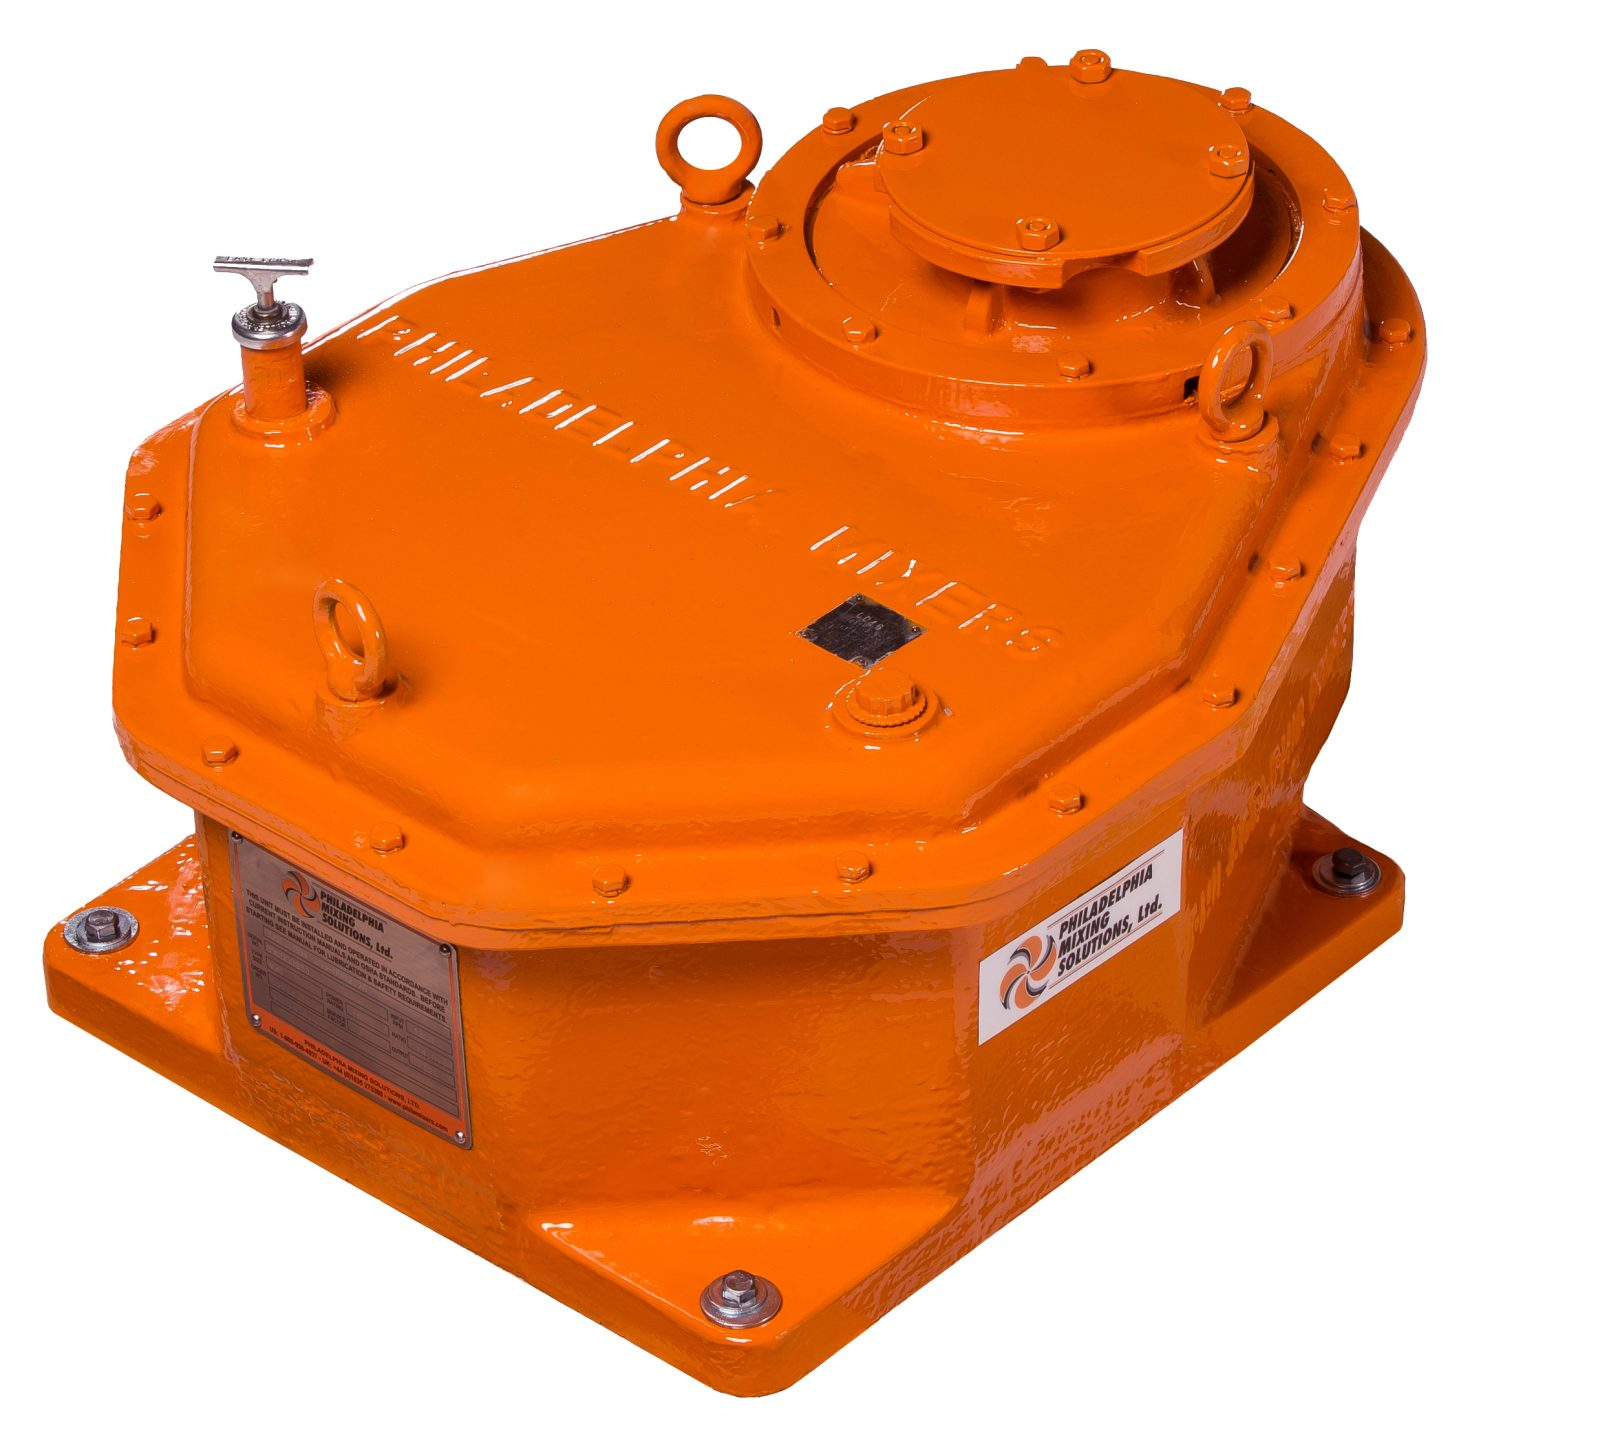 unifirst-4000-series-mixer-houk-inc